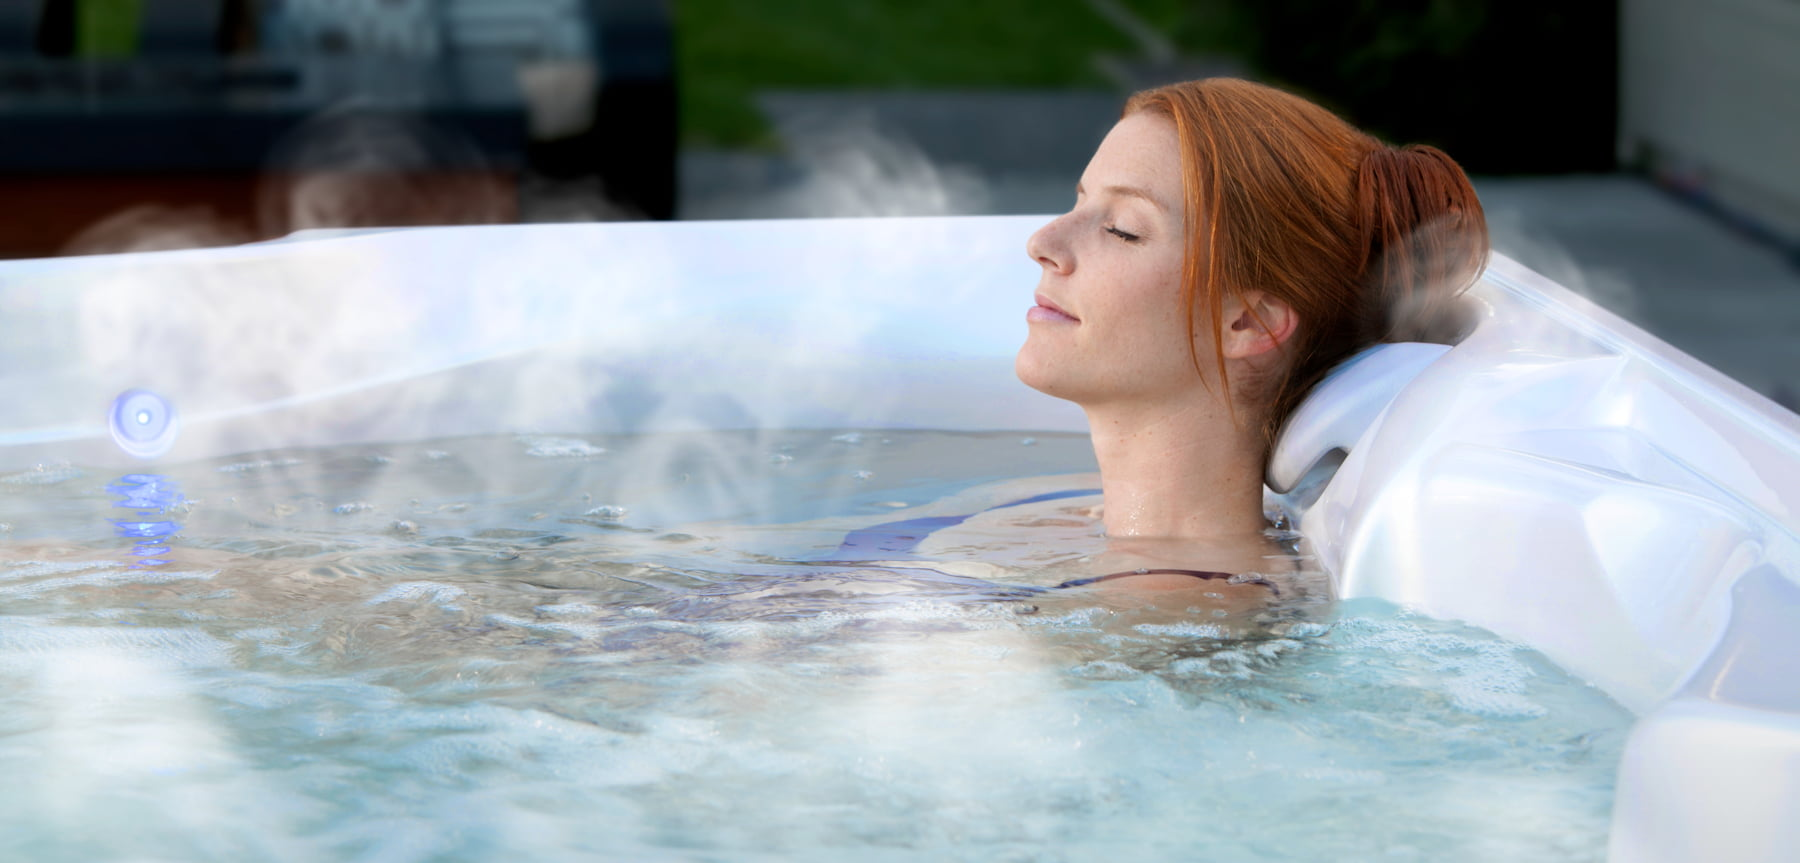 Soaking in a Hot Tub